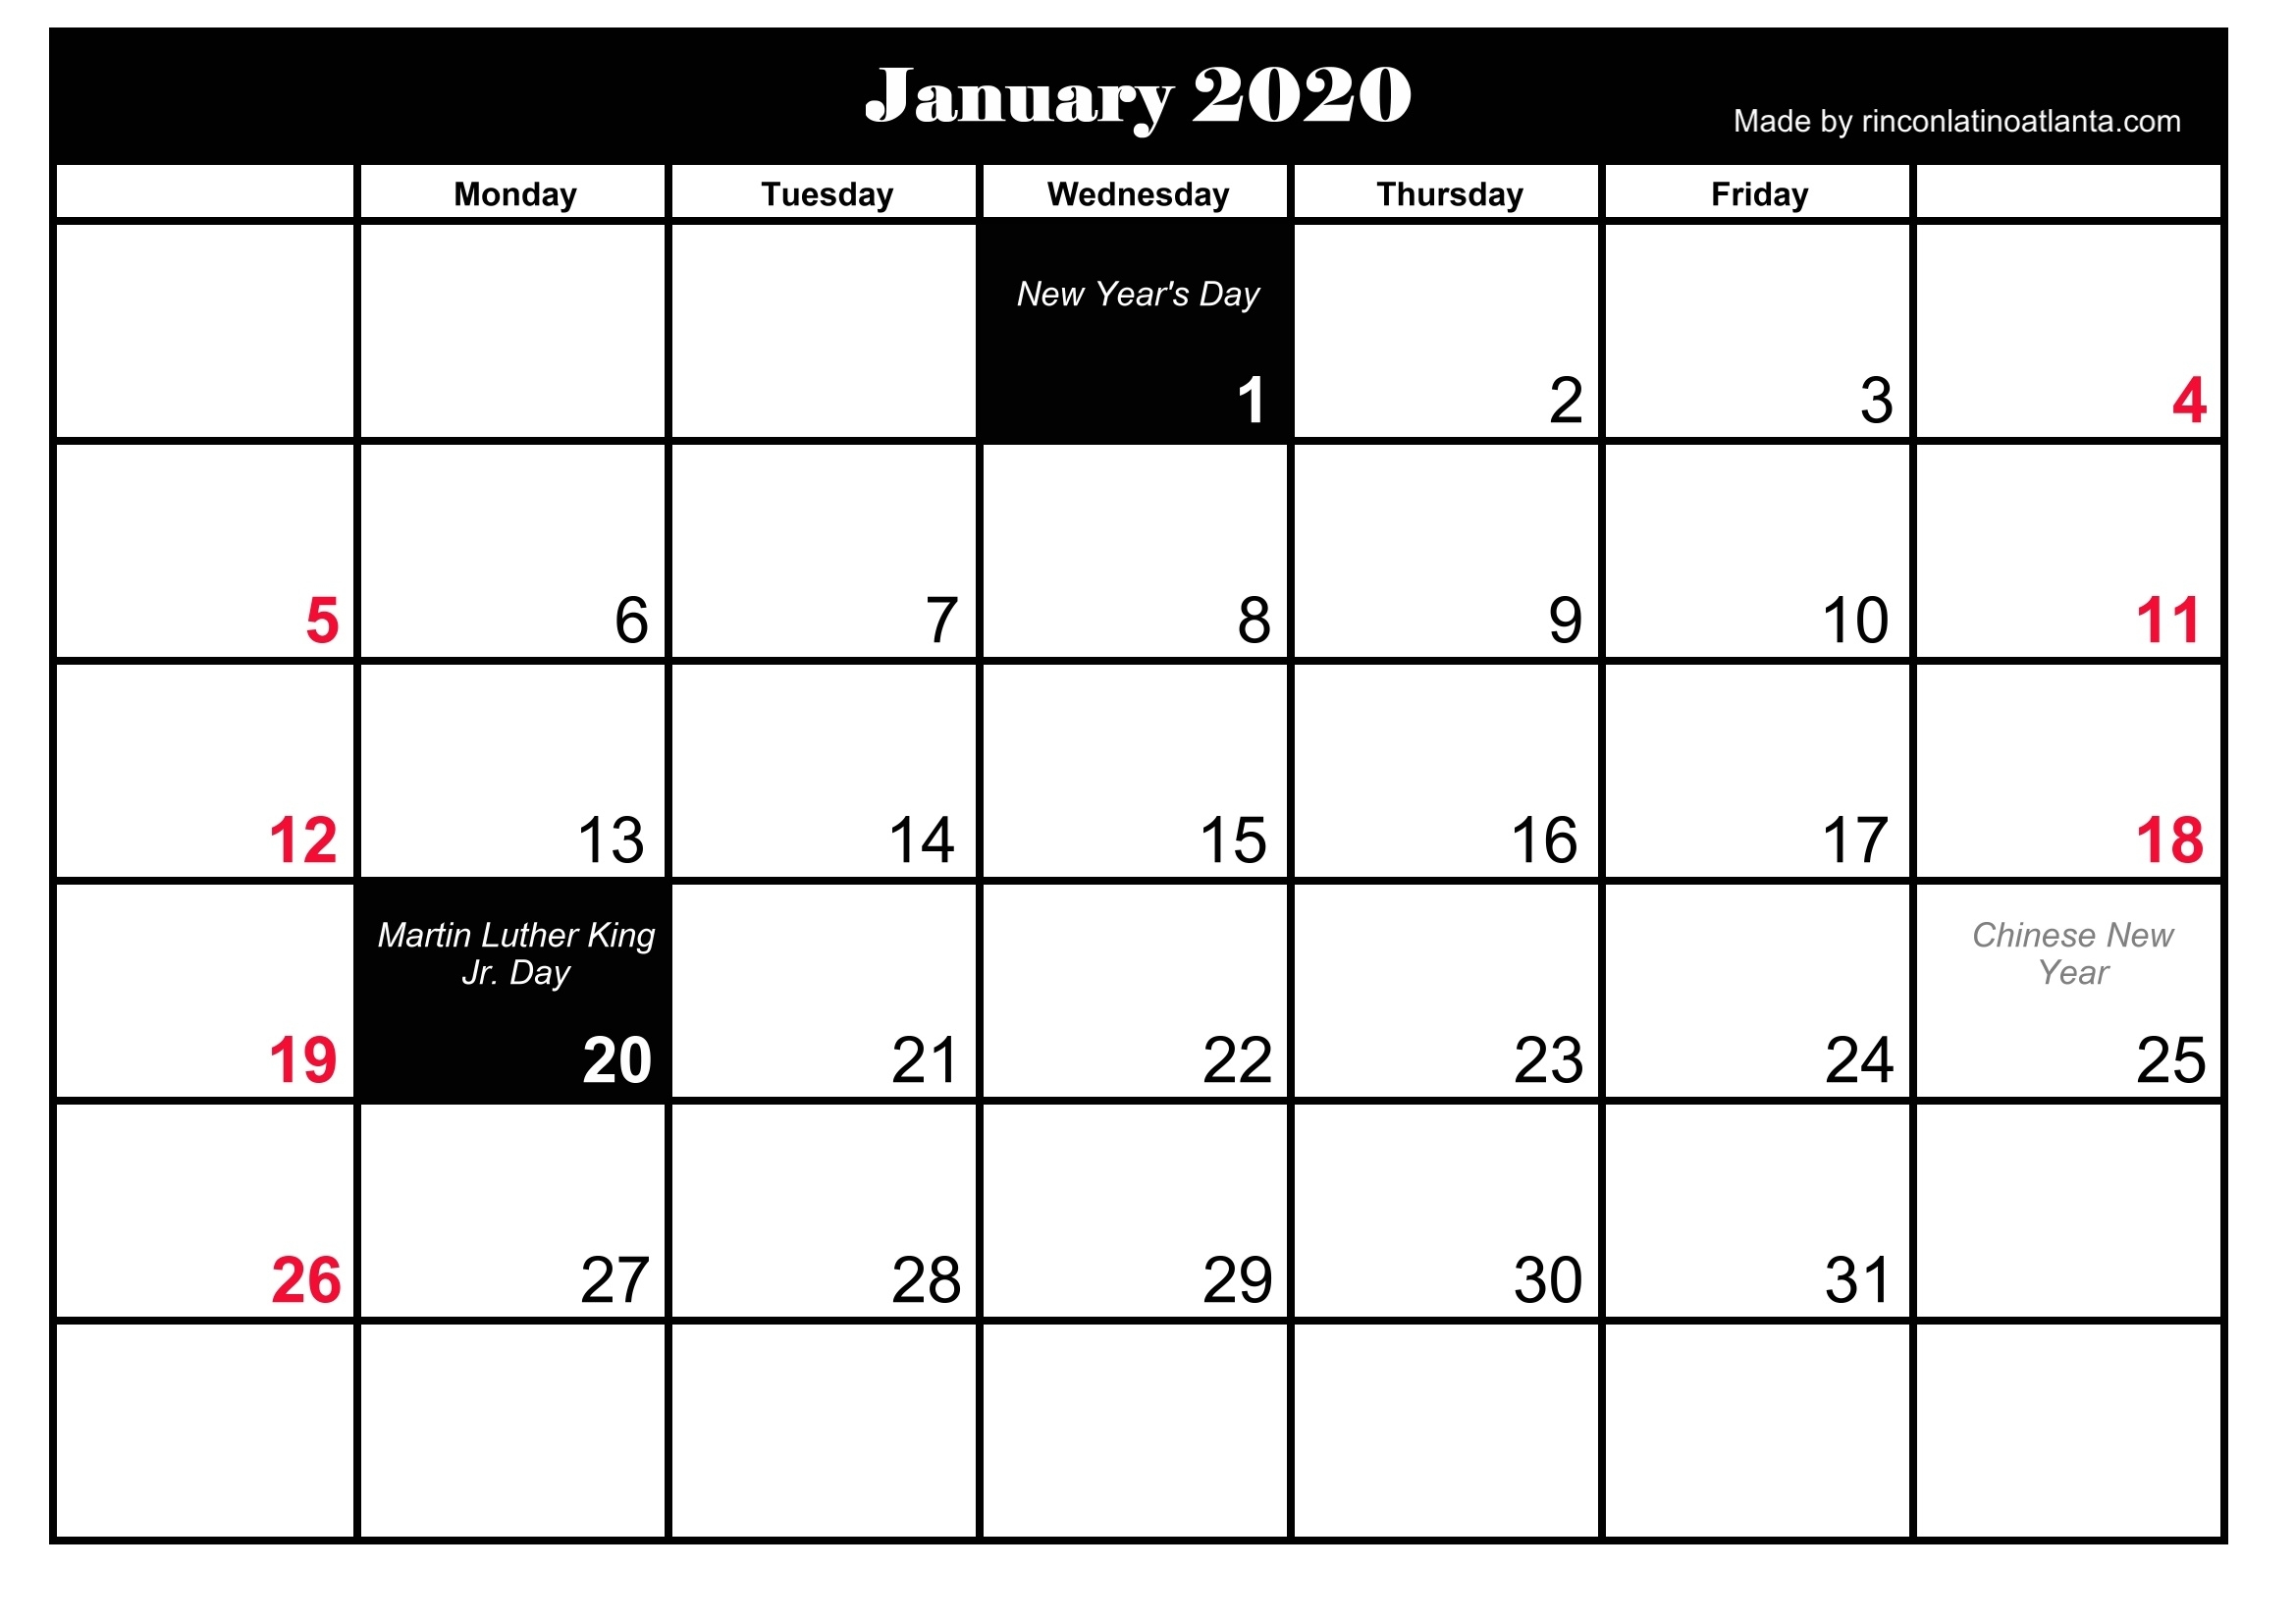 January 2020 Holidays Calendar